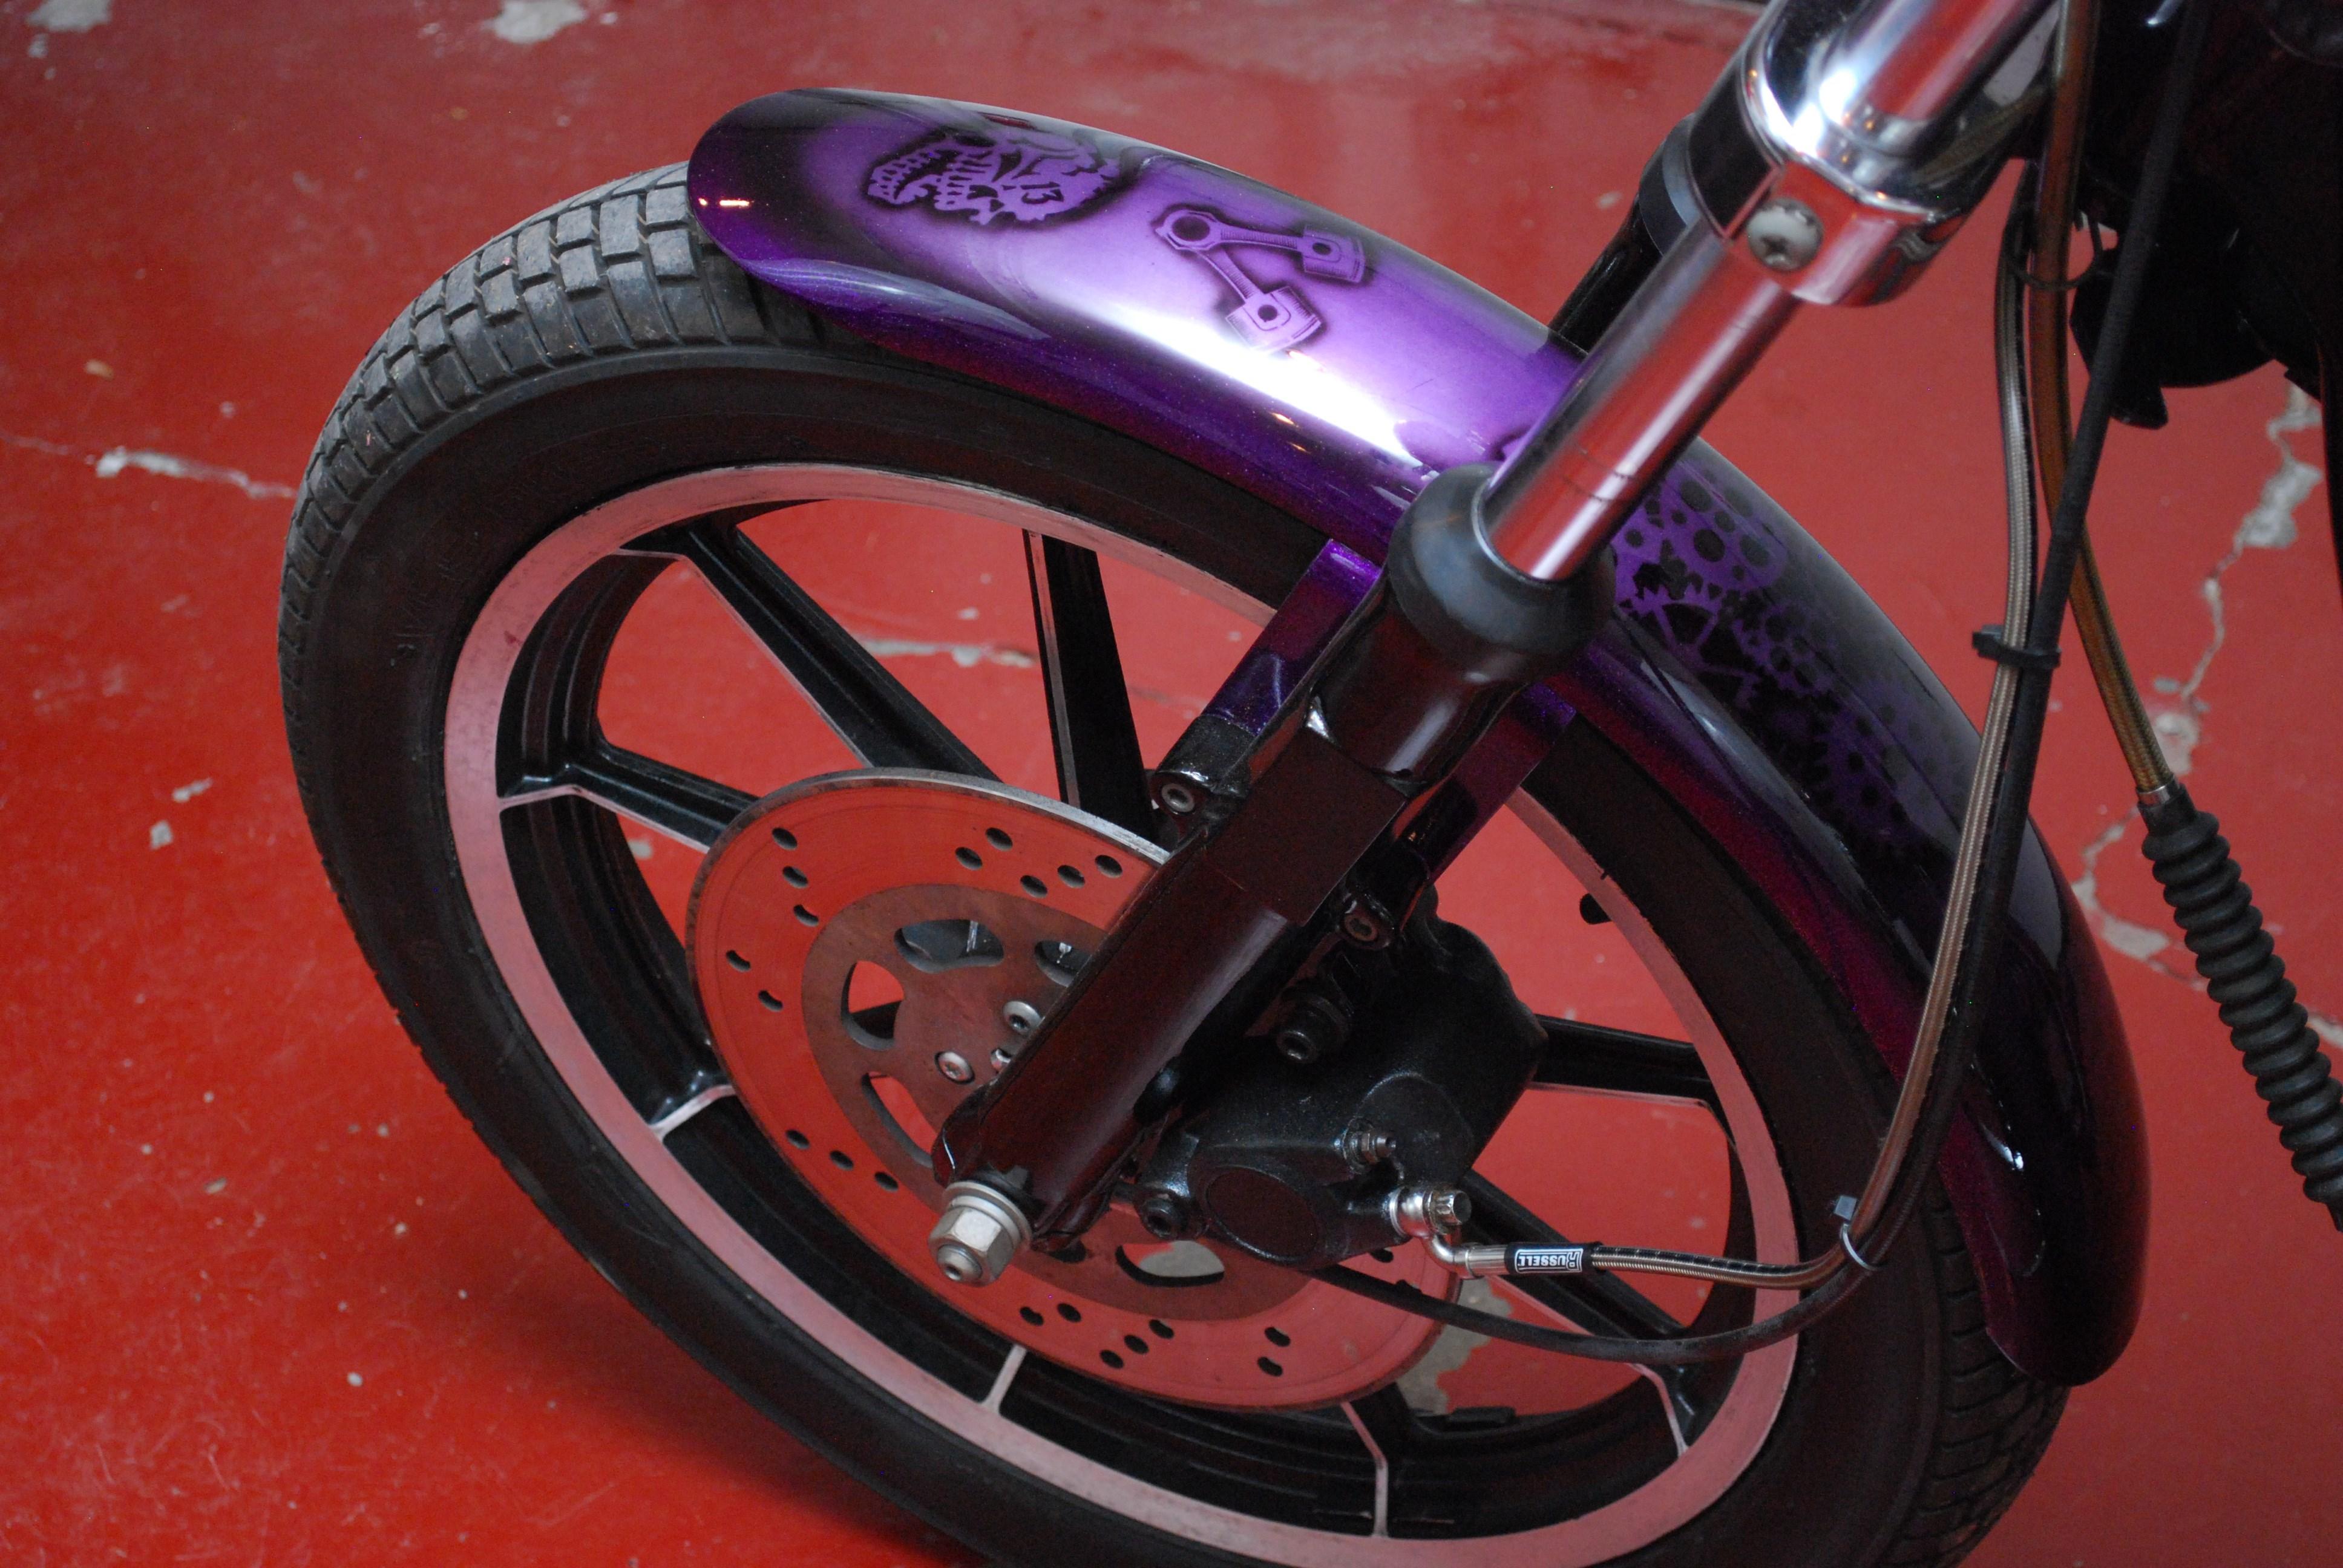 1986 Harley Davidson Xlh 1100 Sportster Purple Metal Flake Custom Paint Dudley Massachusetts 551481 Chopperexchange